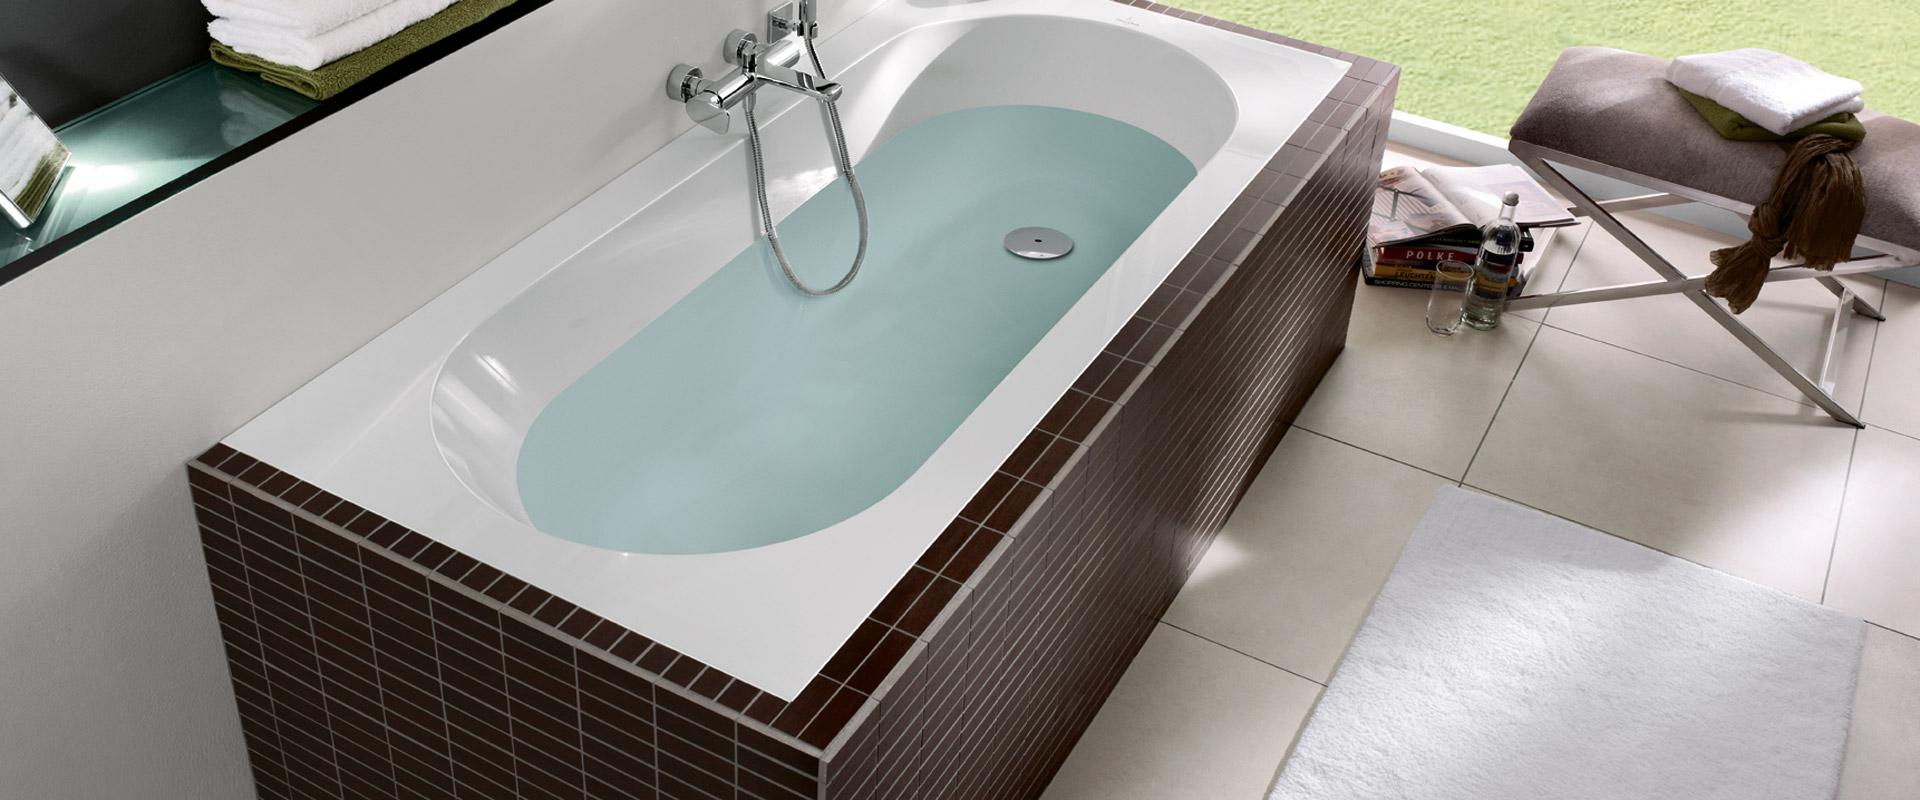 Oberon collection by villeroy boch rectangular bathtubs for Bathroom planner villeroy